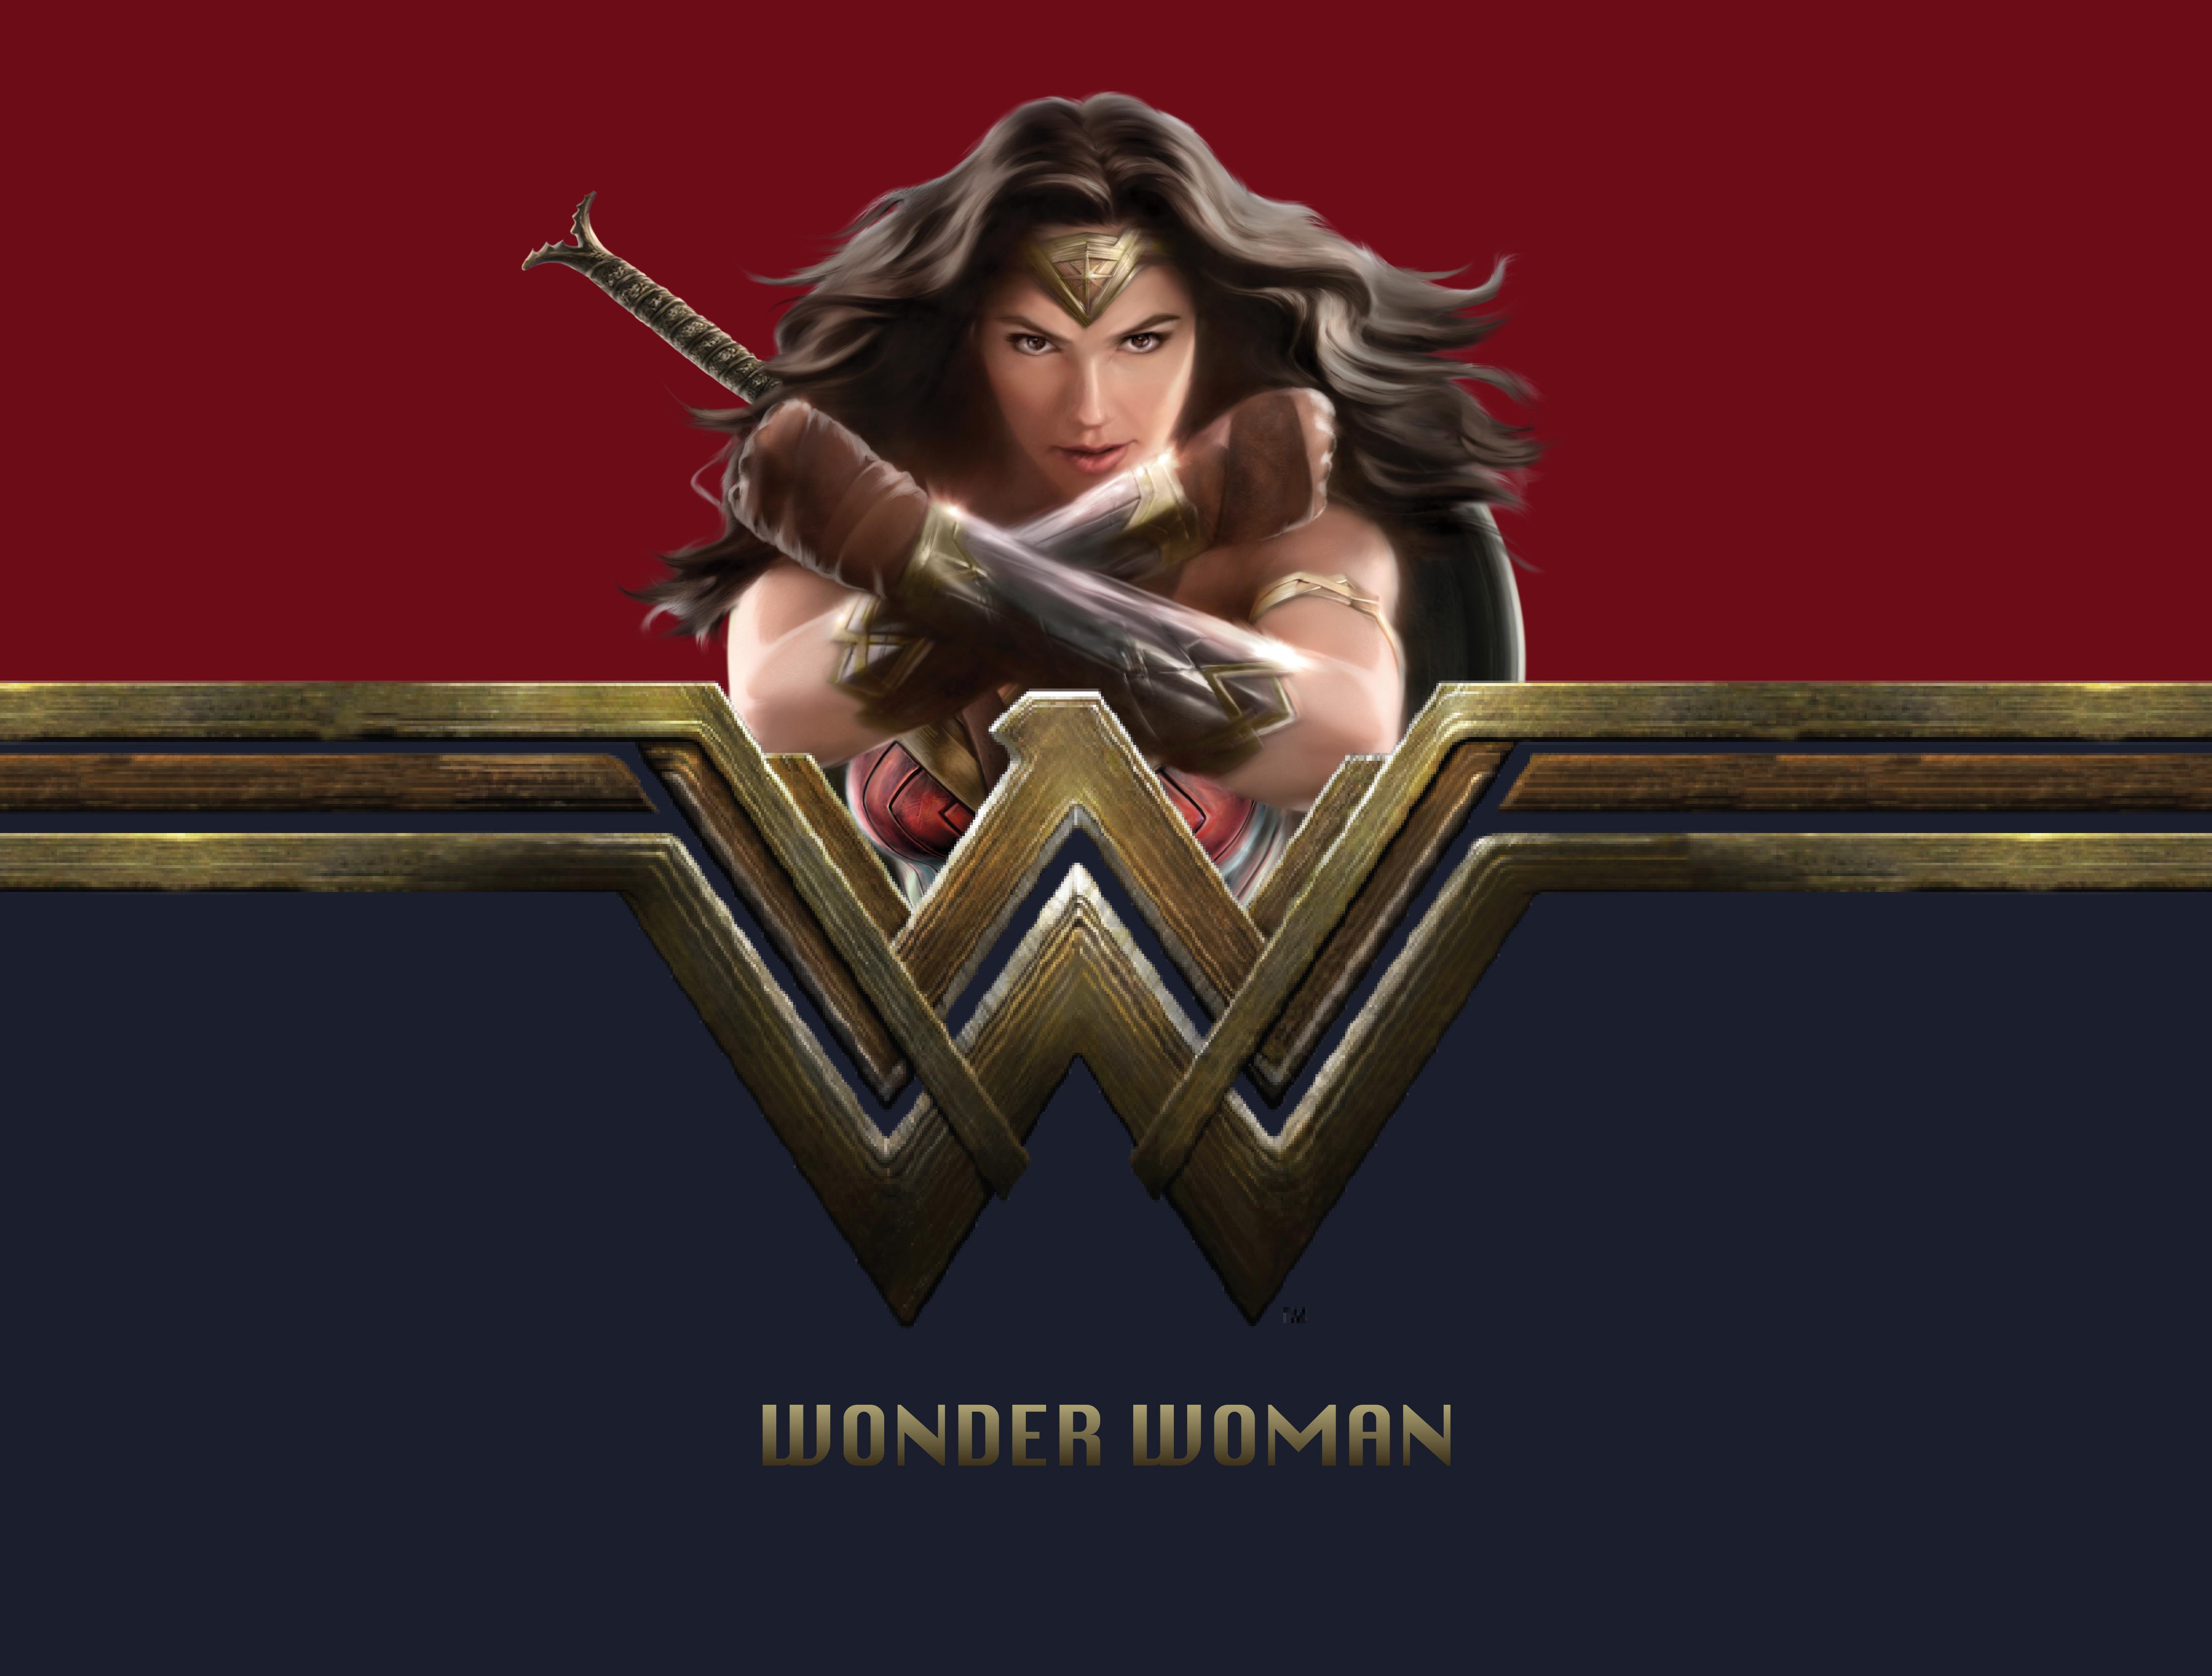 1280x1024 Wonder Woman Movie 1280x1024 Resolution Hd 4k: Wonder Woman 5k New Artwork, HD Superheroes, 4k Wallpapers